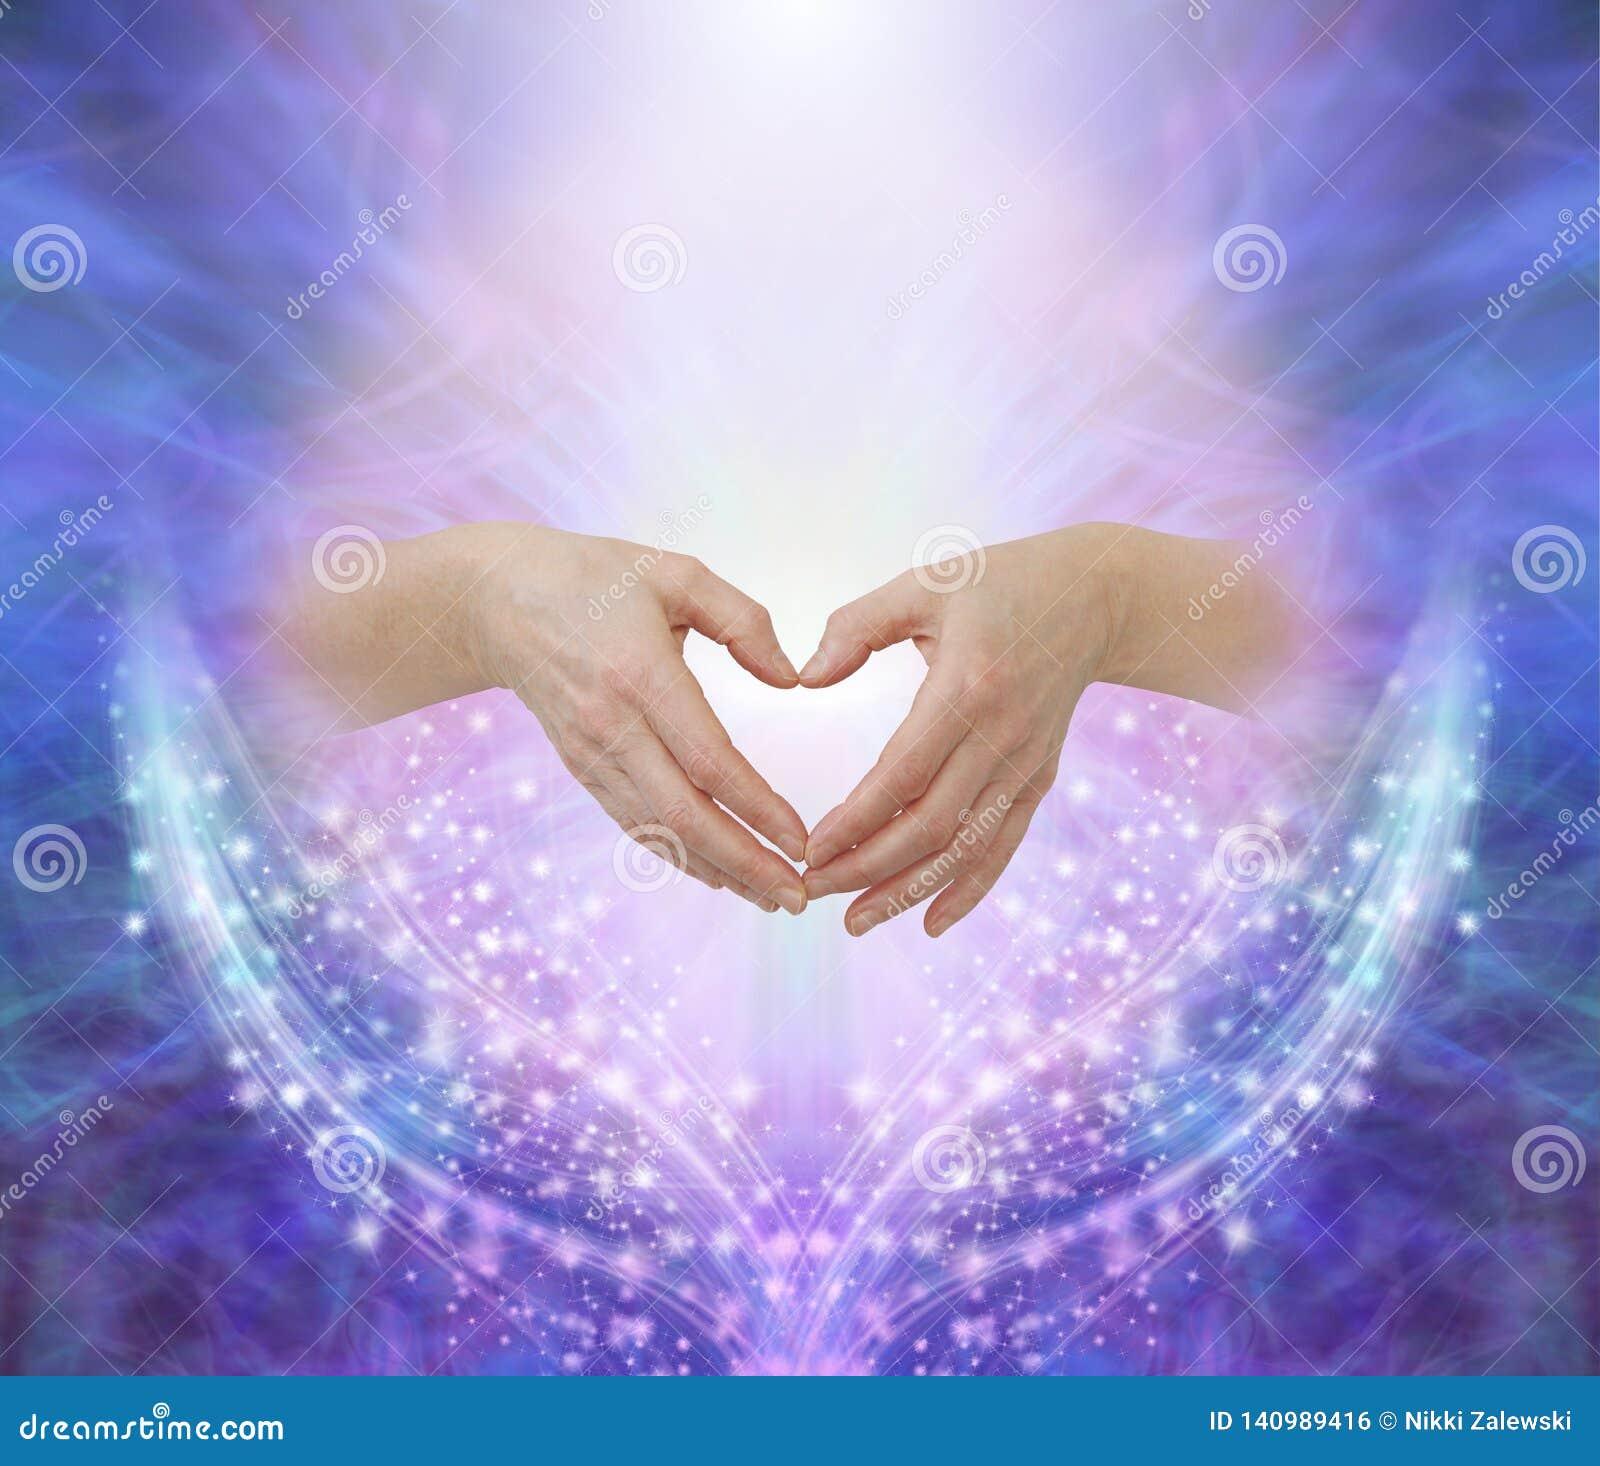 Healers hands making a humble heart shape